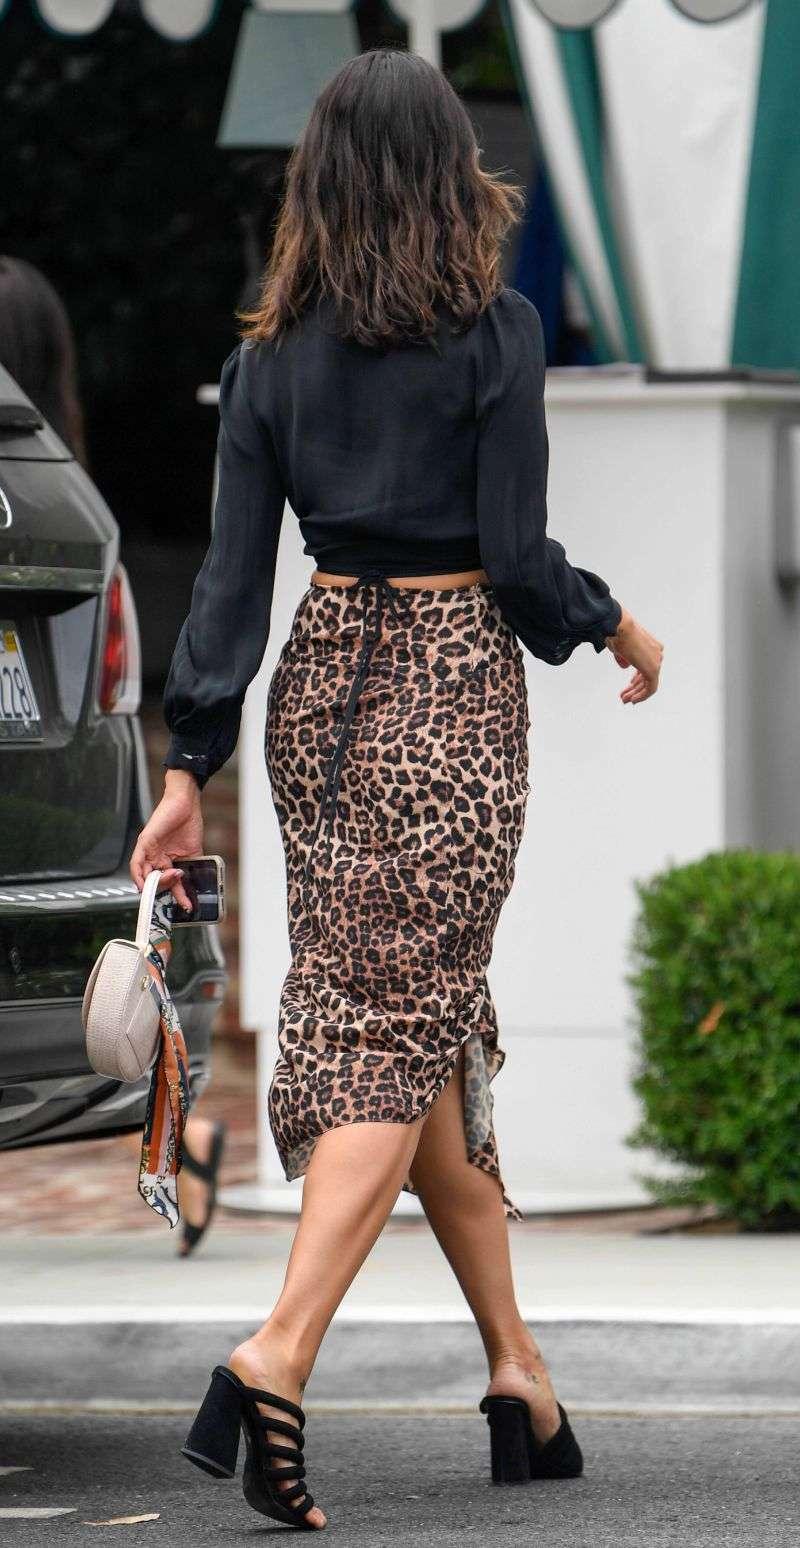 Eiza Gonzalez Hot Pics in Black Dress in Los Angeles Hd